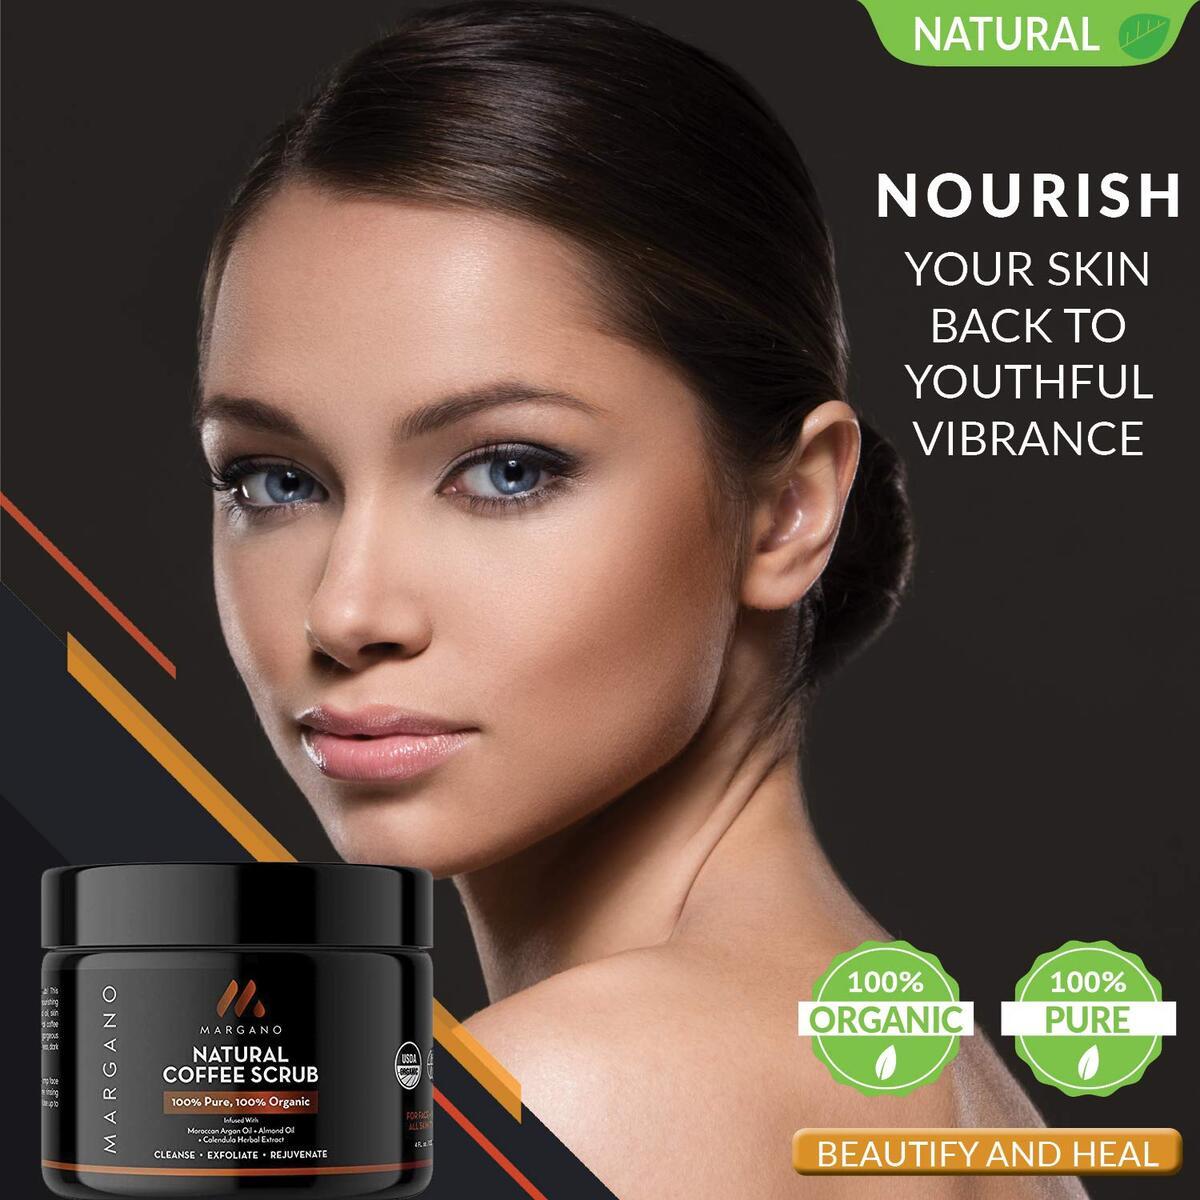 100% Natural Coffee Scrub : Face & Body w/Moroccan Argan Oil +Calendula Extract+ Almond Oil by Margano